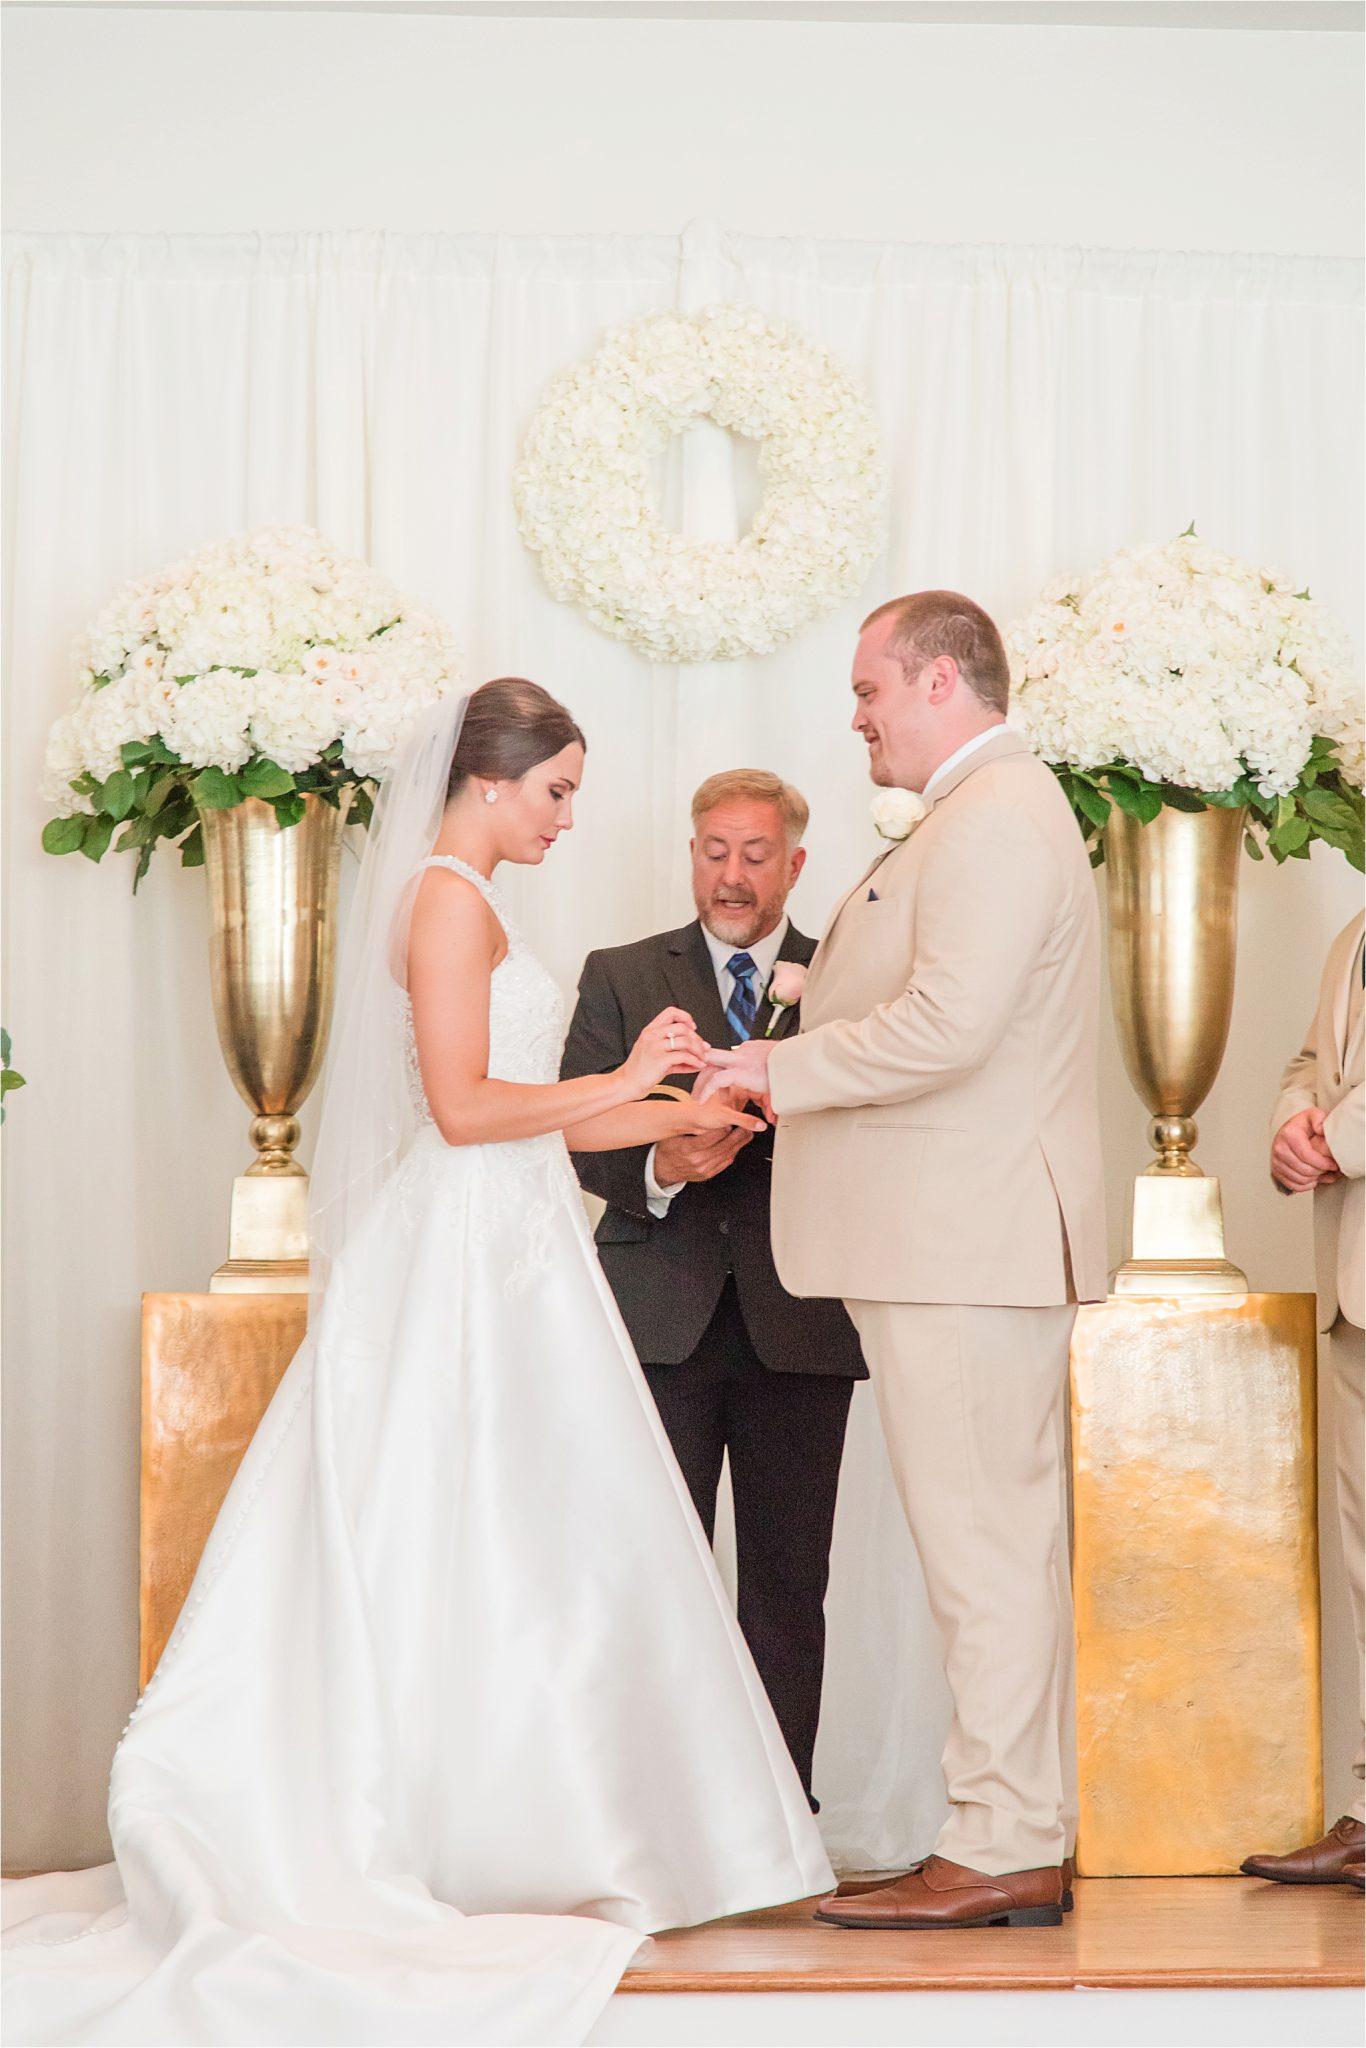 Sonnet House, Birmingham Alabama Wedding Photographer, Bridal portraits